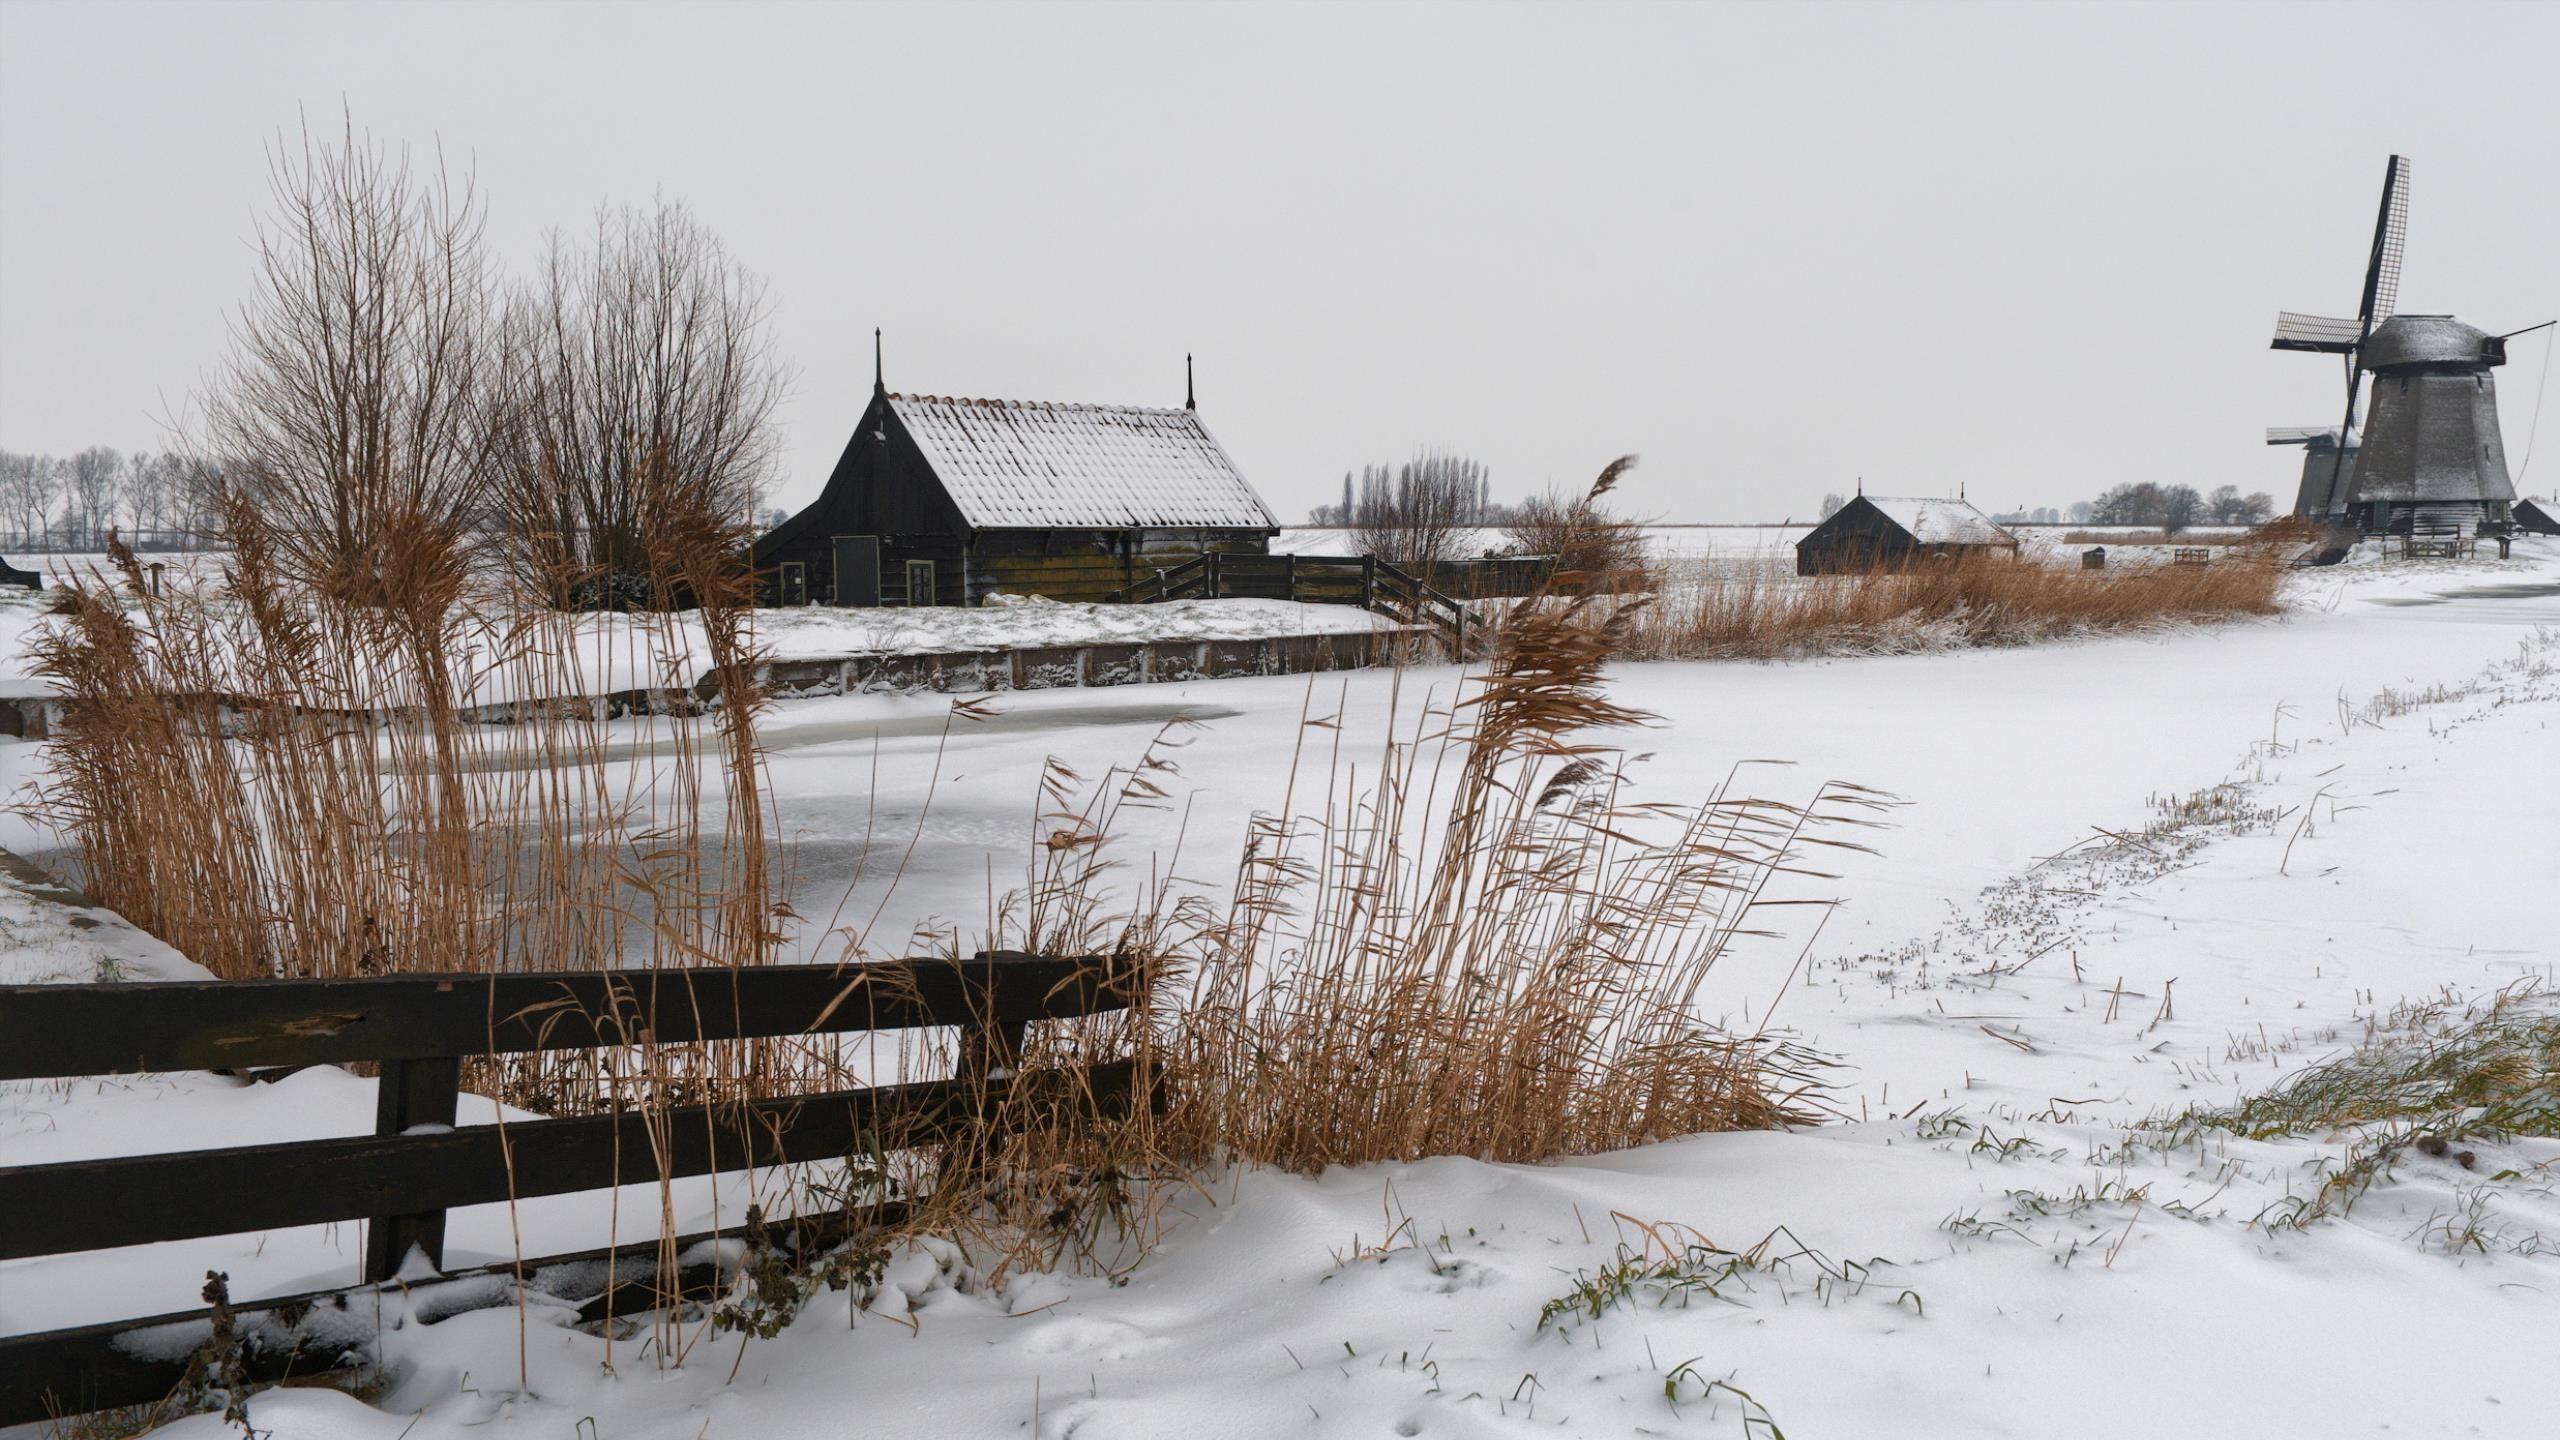 winter farm scene Art Ideas Winter landscape, Snow